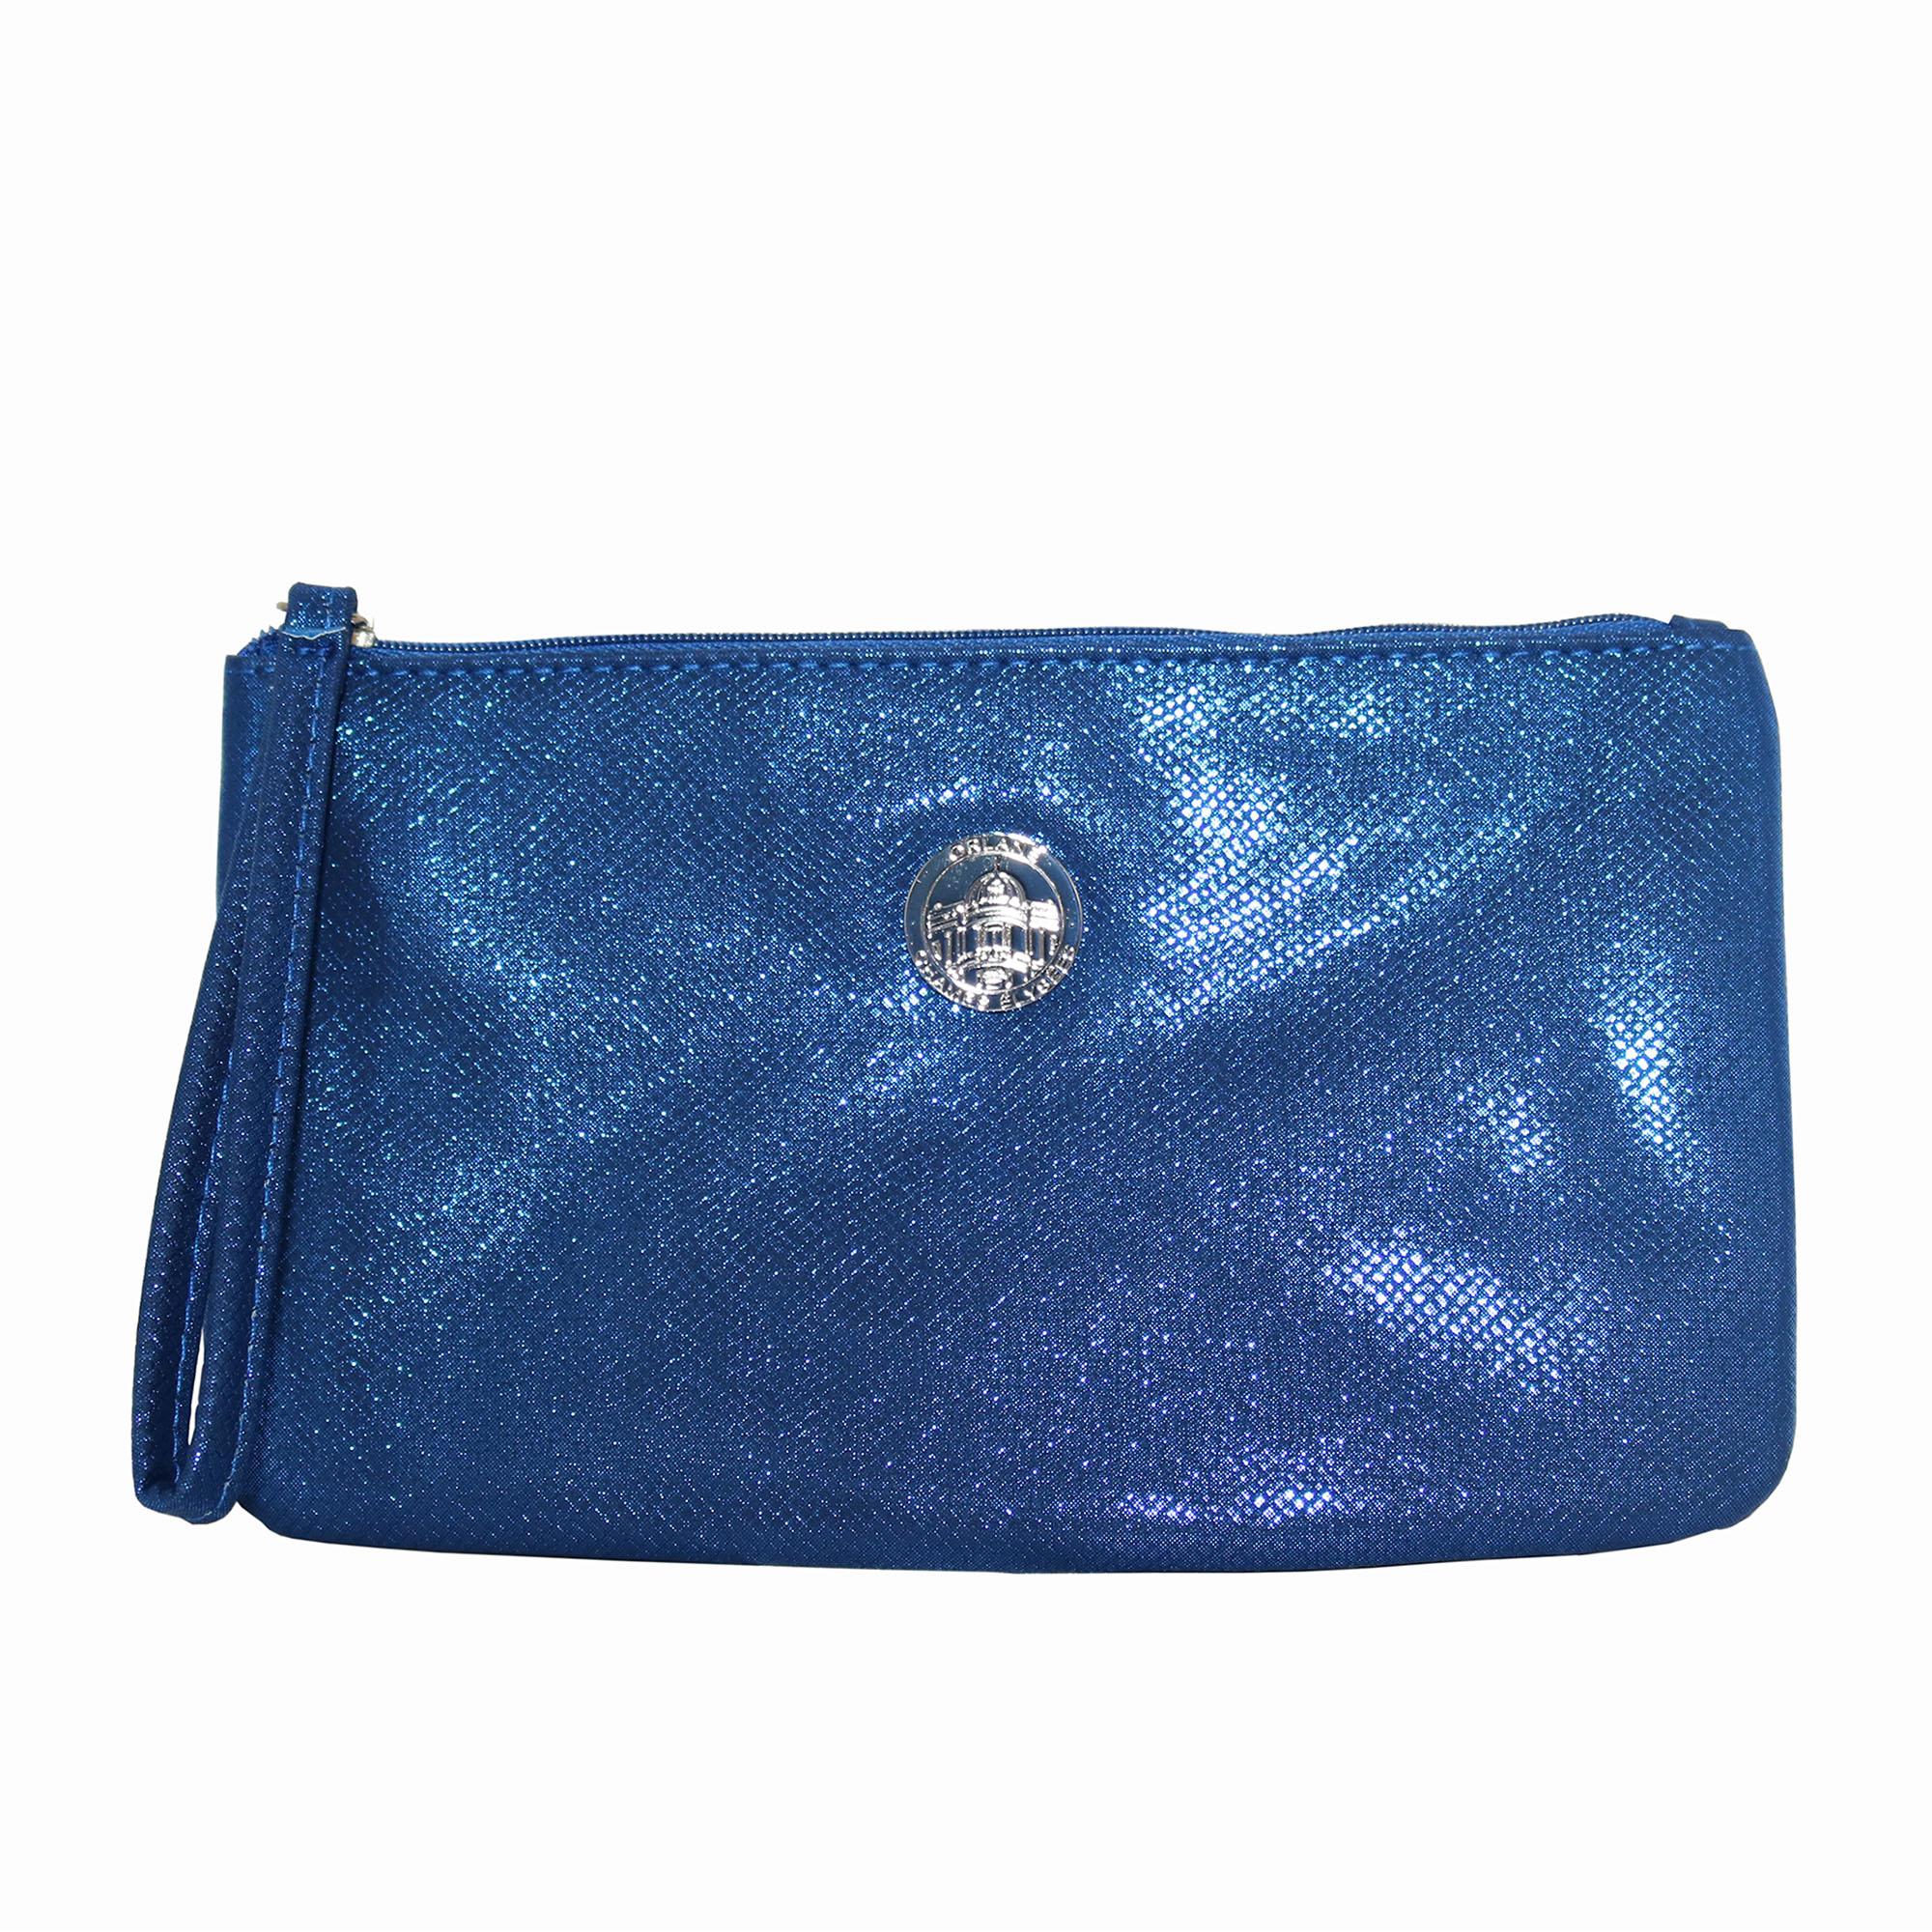 کیف لوازم آرایش زنانه اورلین مدل Flat